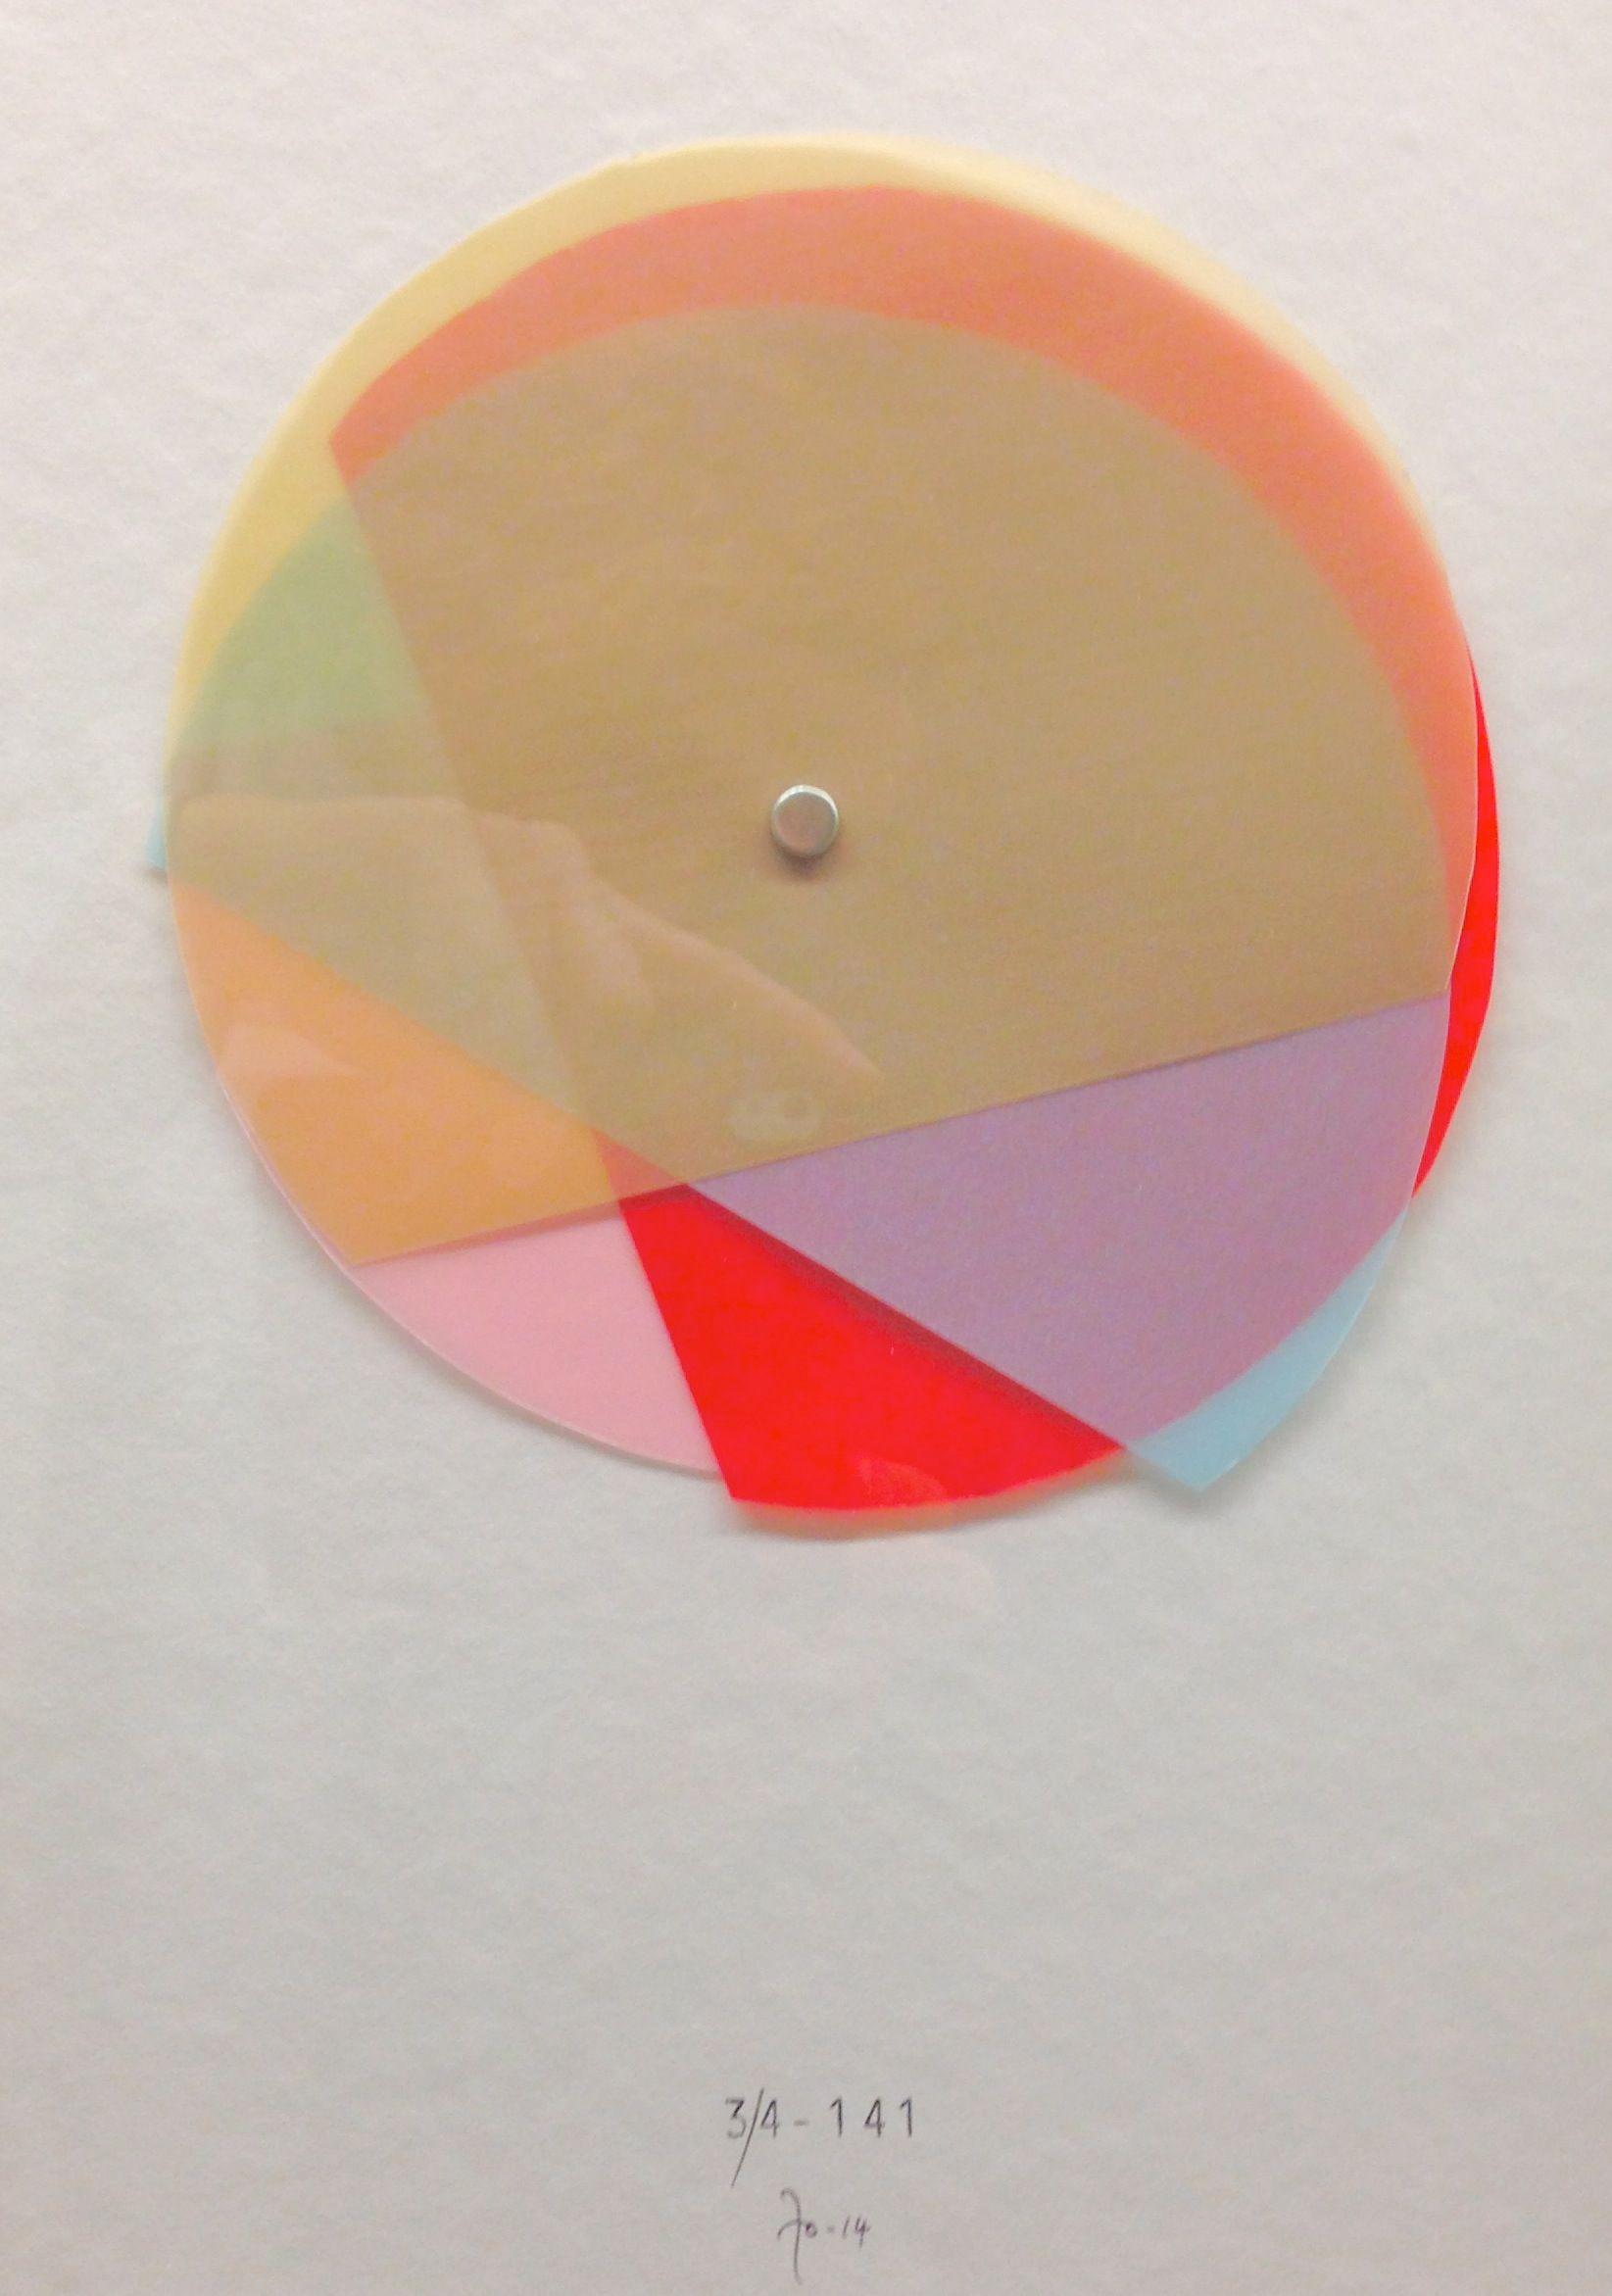 Diy haus konstruktiv zrich ch 2015 colours pinterest diy haus konstruktiv zrich ch moveable pie chart with translucent vellum paper nvjuhfo Gallery